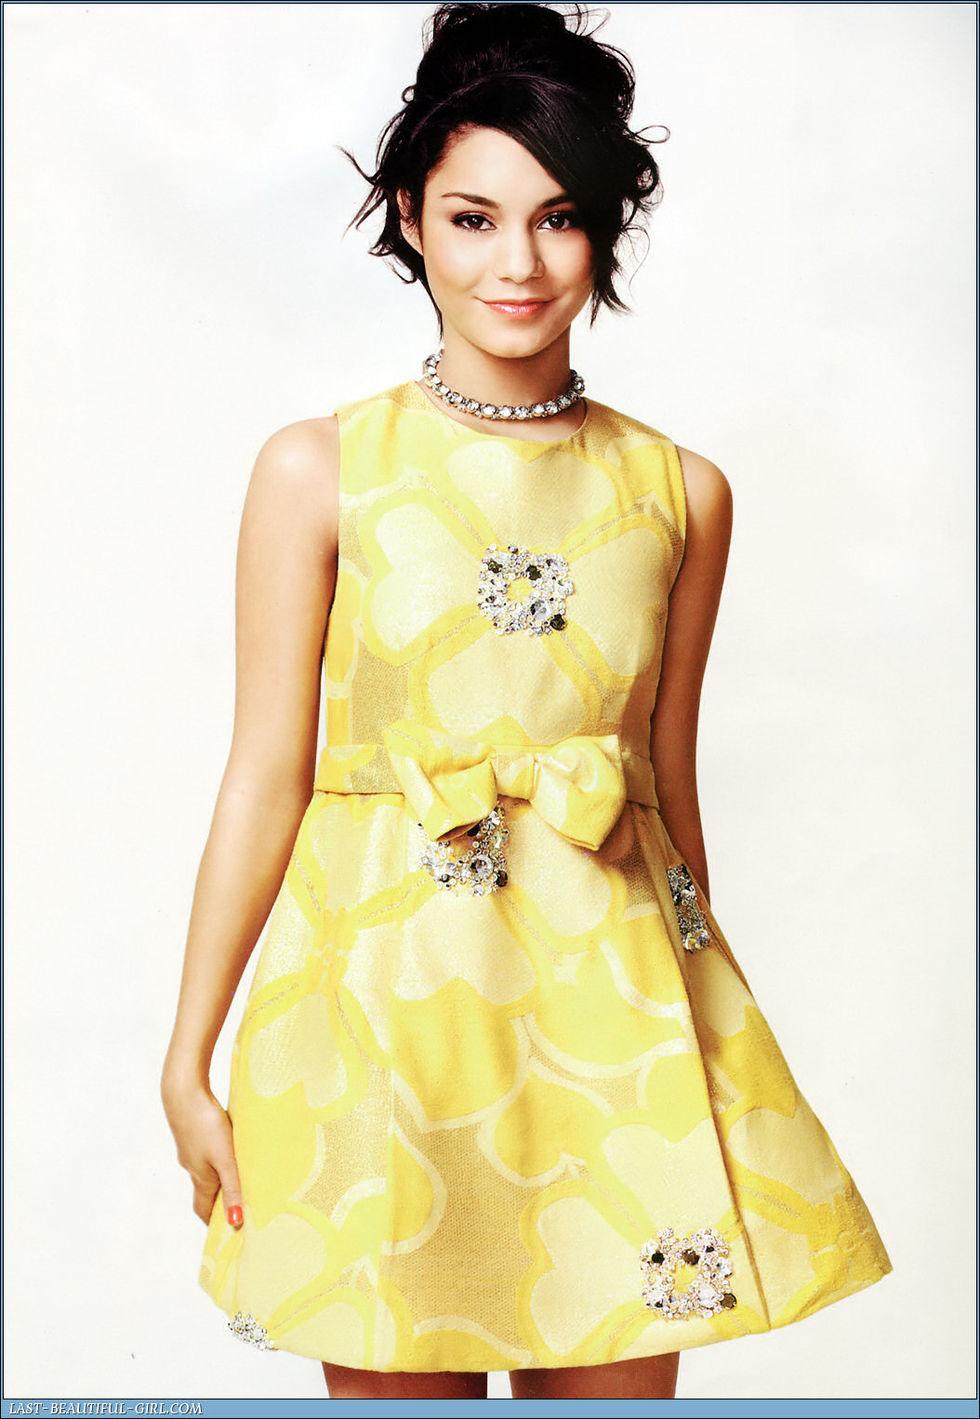 vanessa-ann-hudgens-glamour-magazine-june-2008-01